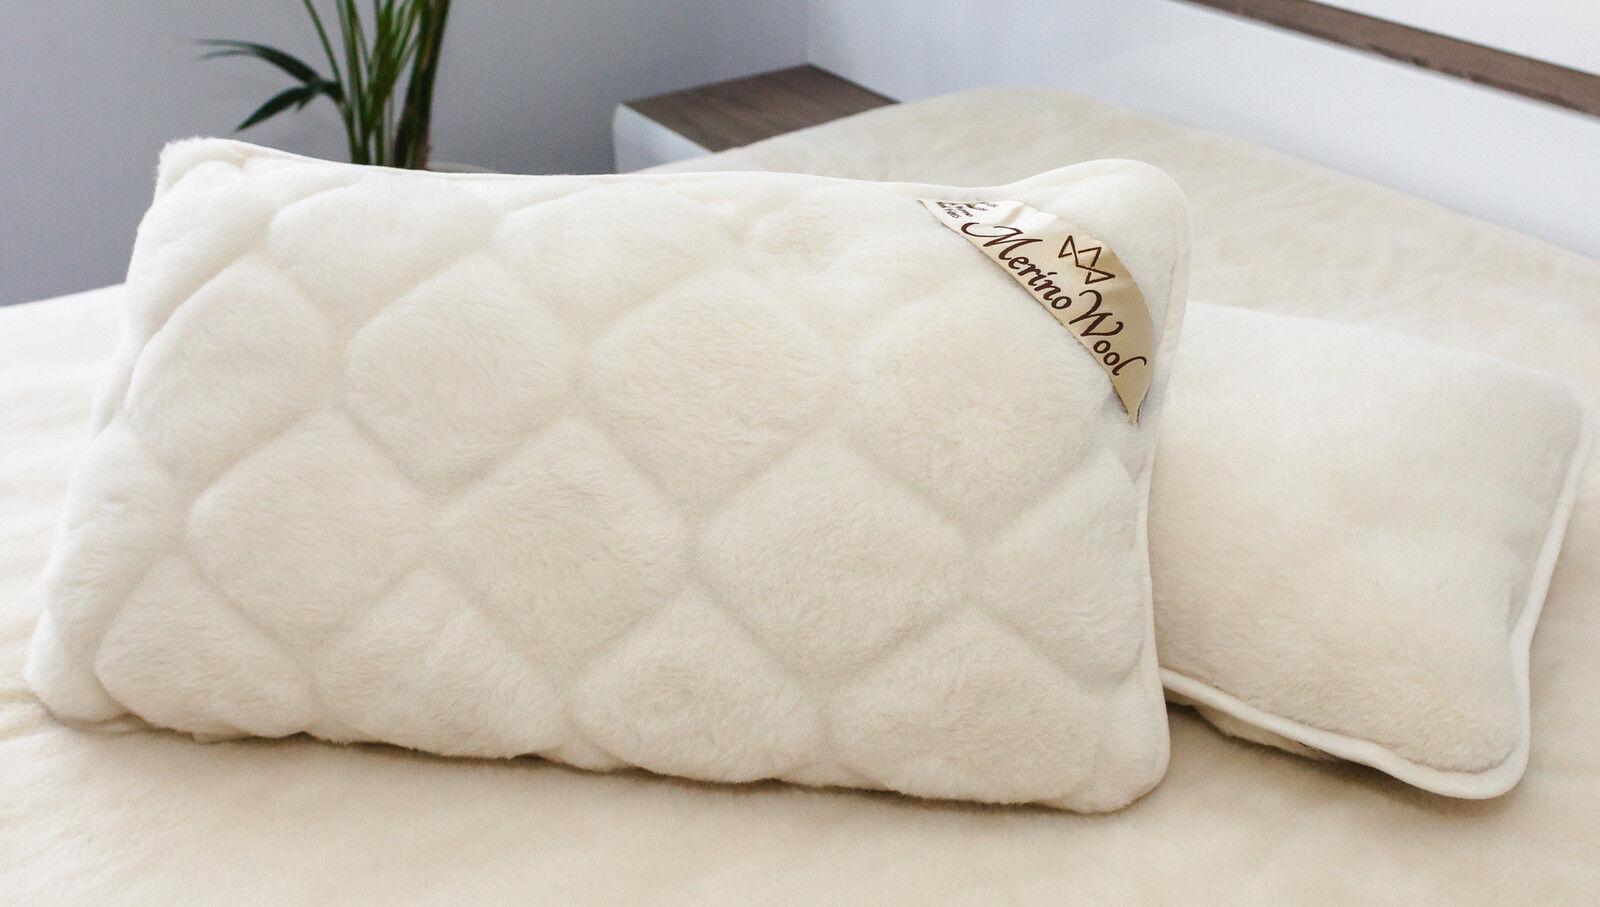 CASHMERE 100% Merino Wool Pillow 23  x 36    58 x 92cm WOOLMARKED  zippeed cover